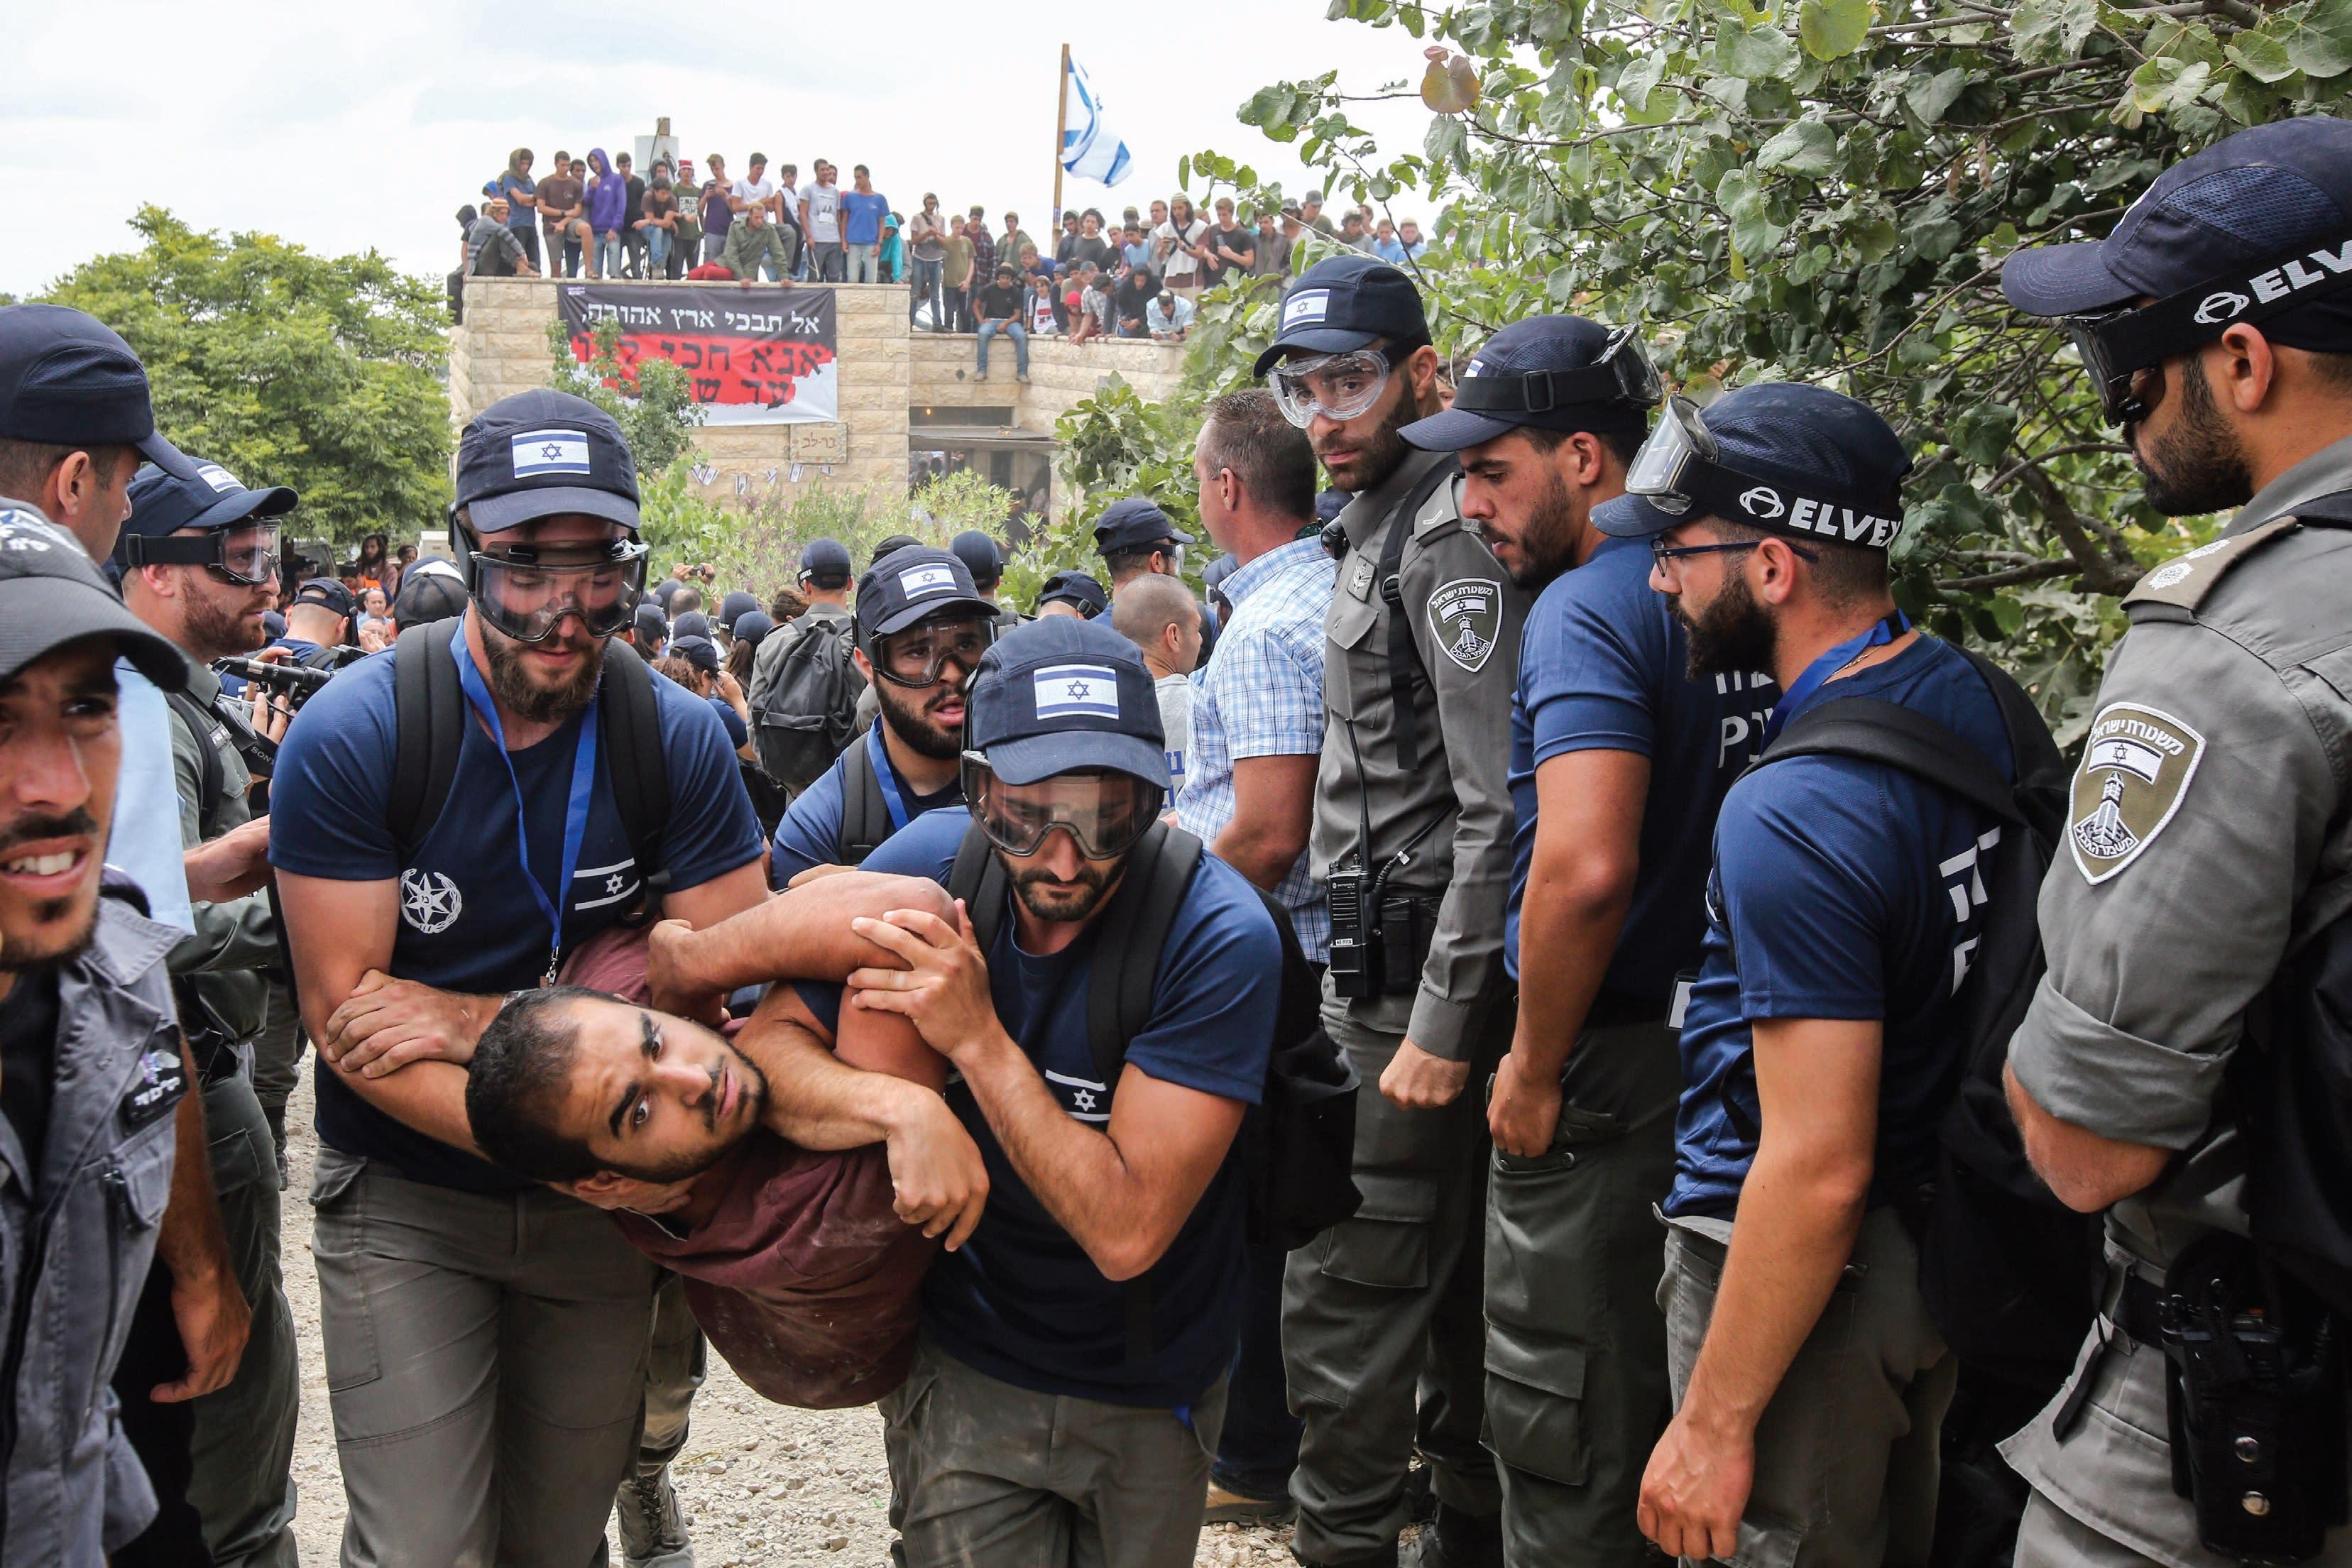 Security forces evict a demonstrator from Netiv Ha'avot, June 12, 2018 (Marc Israel Sellem)